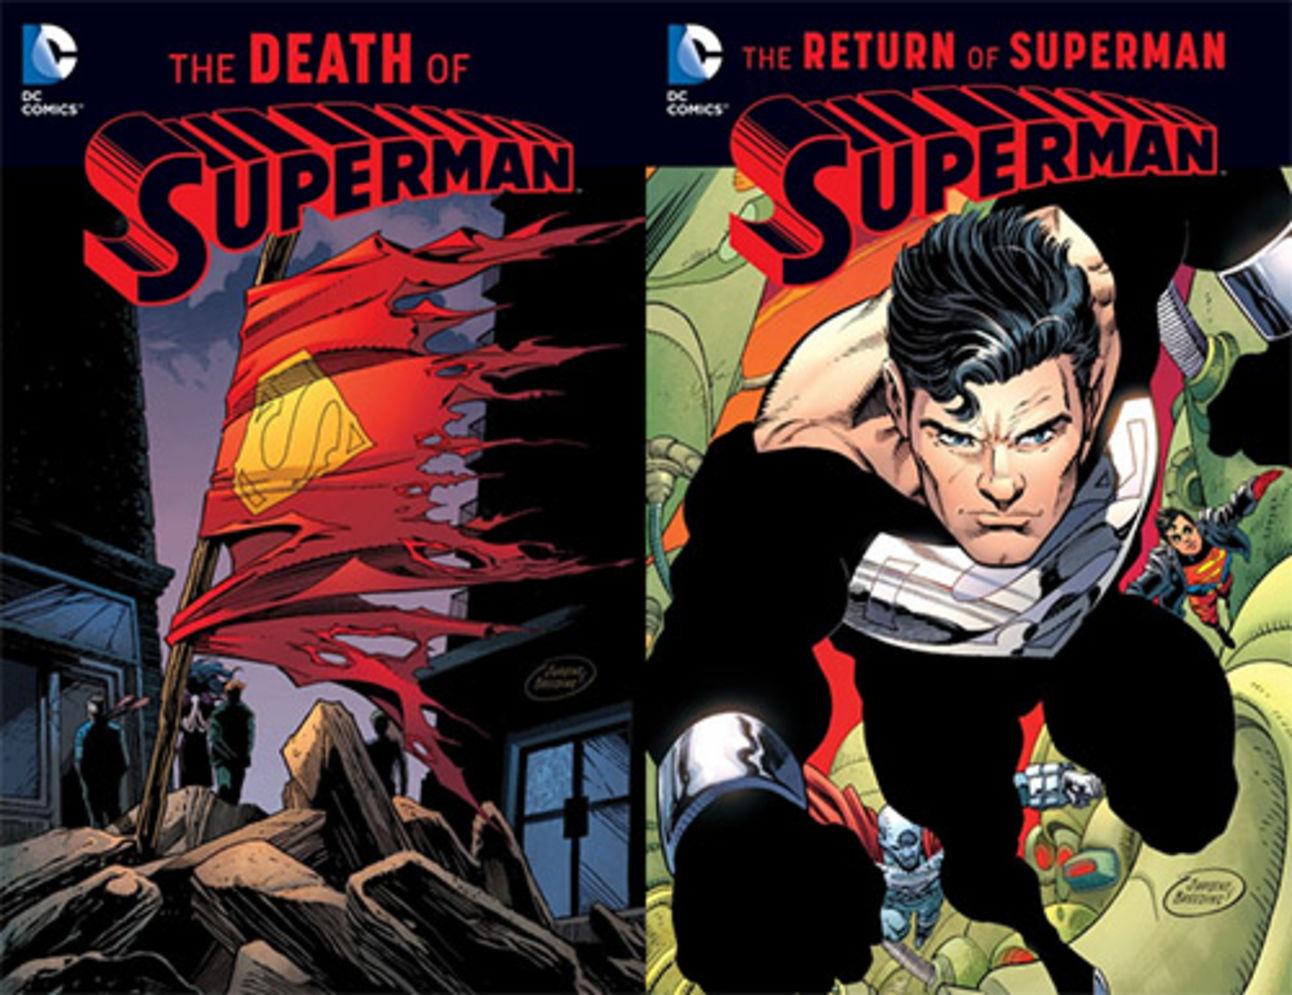 superman-the-death-and-return-of-superman-saga-tpbs-2016.jpg